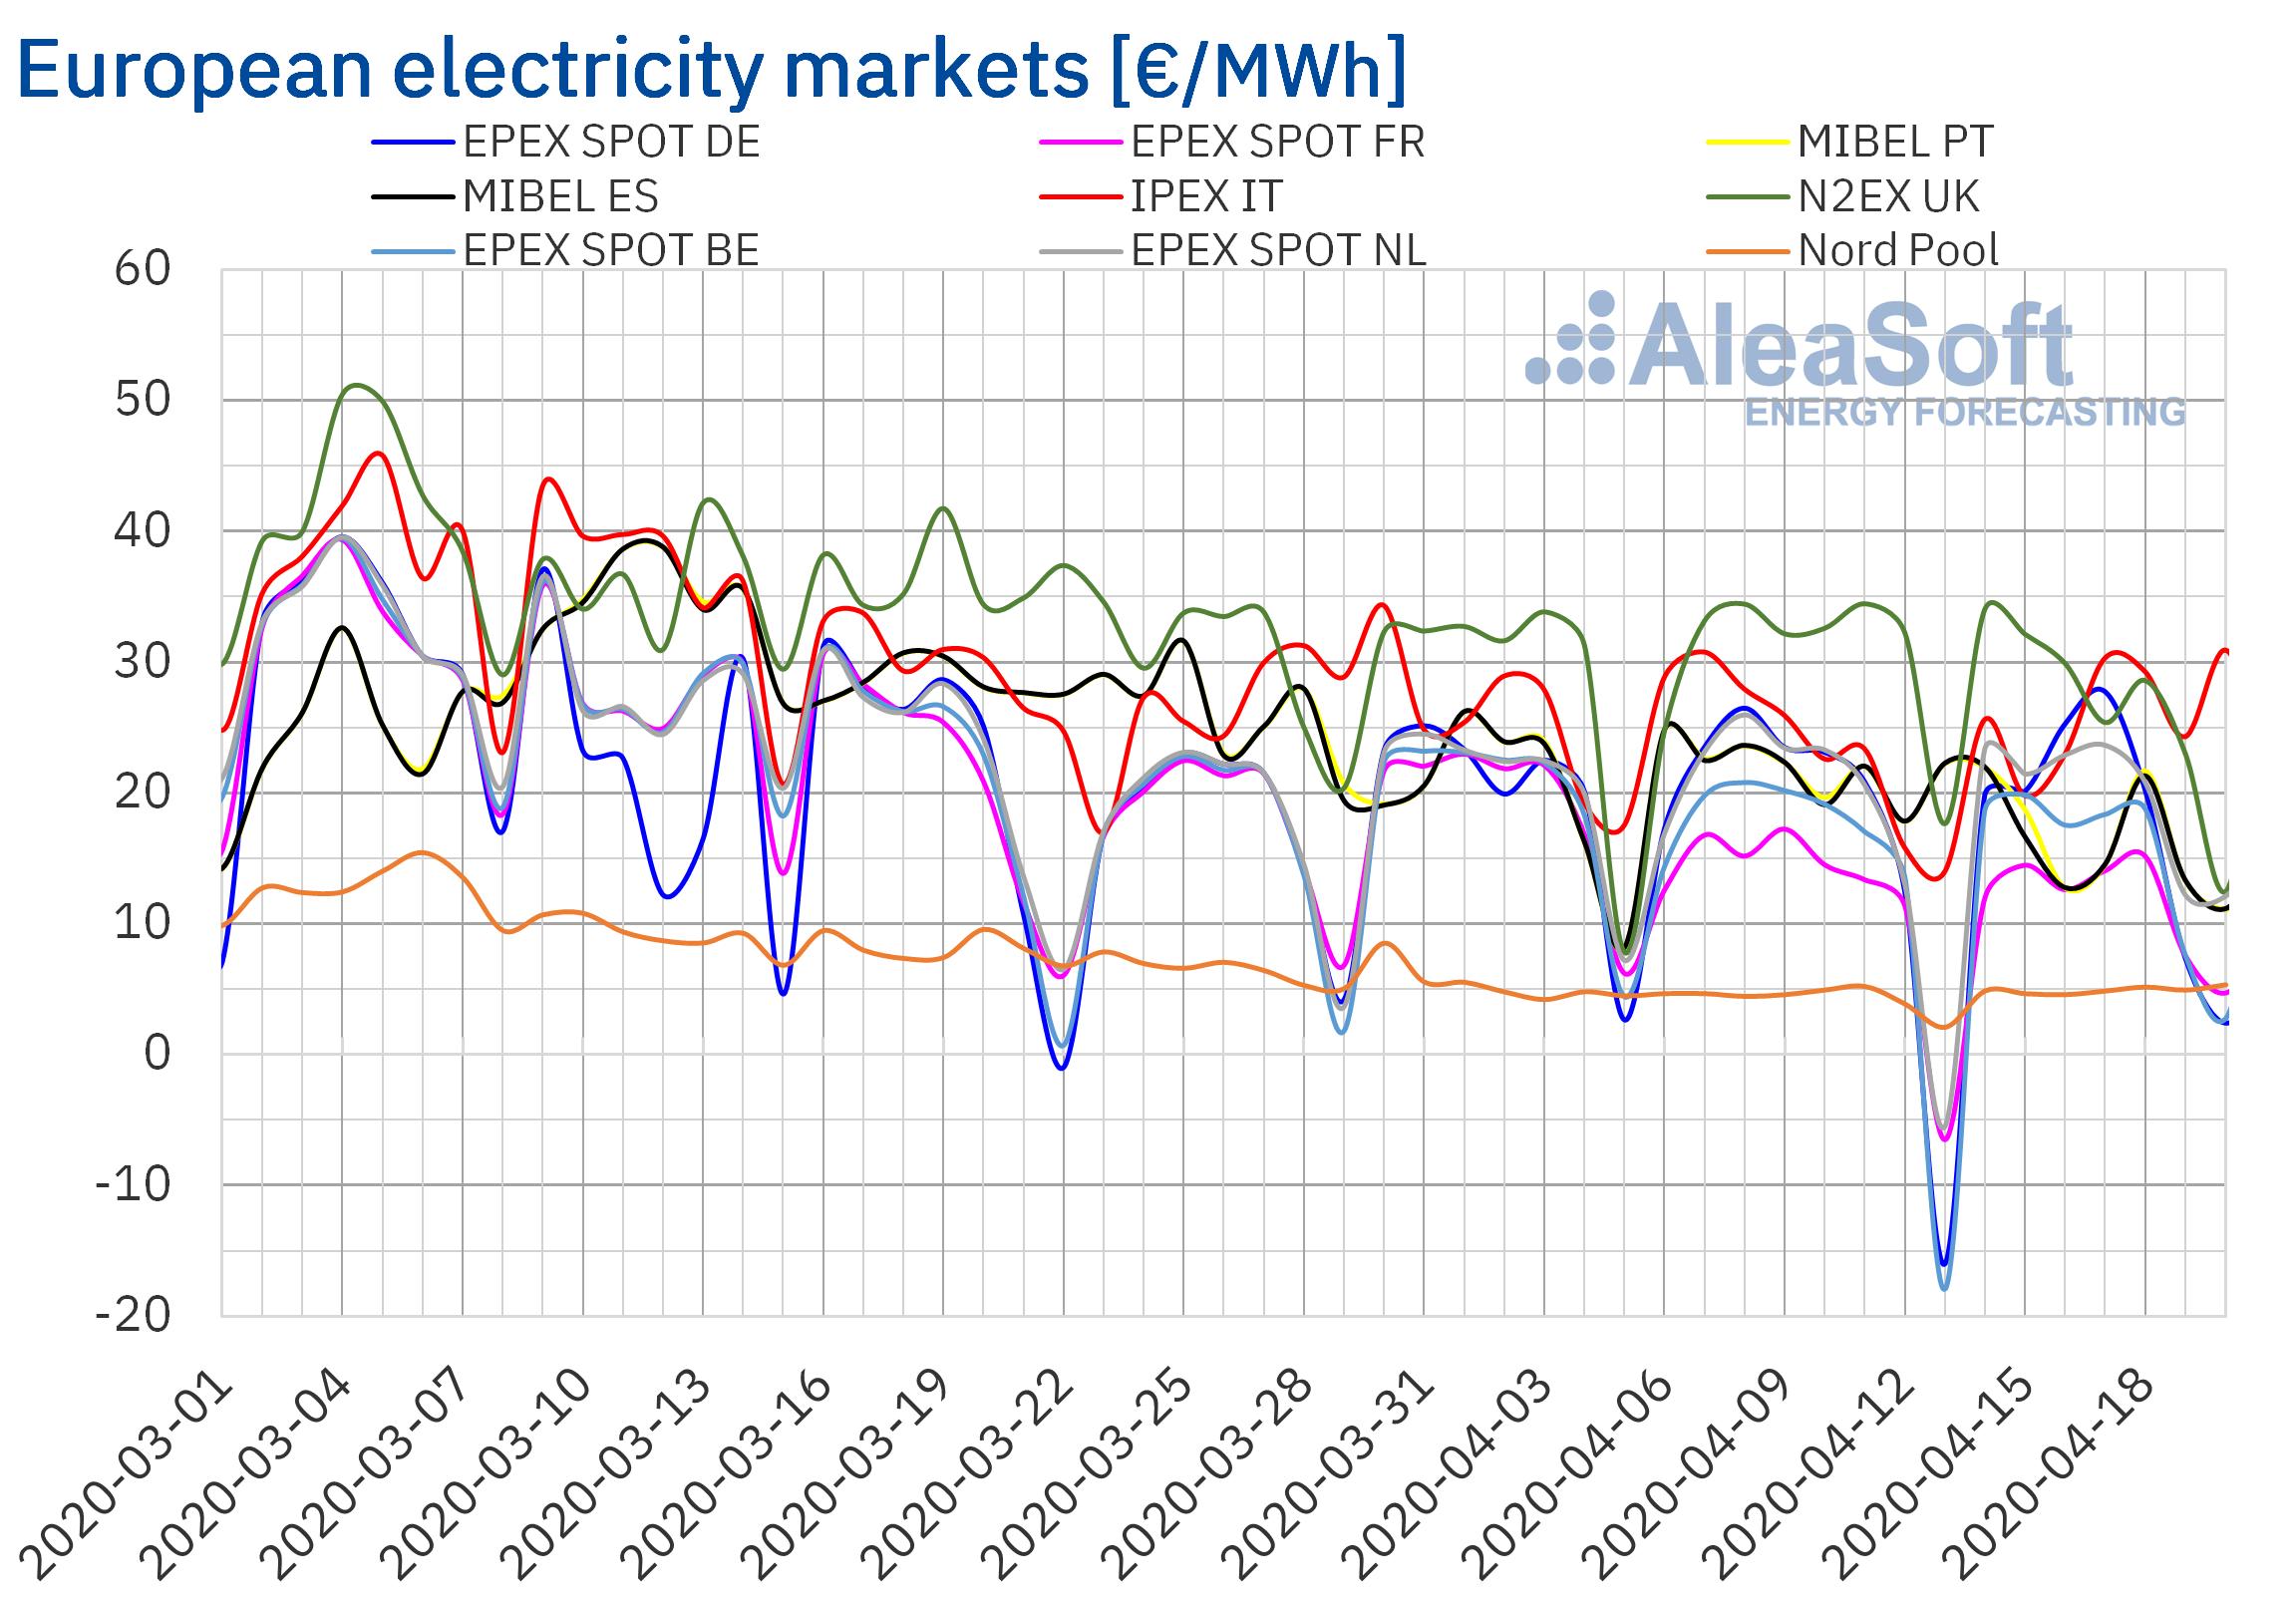 AleaSoft - European electricity market prices